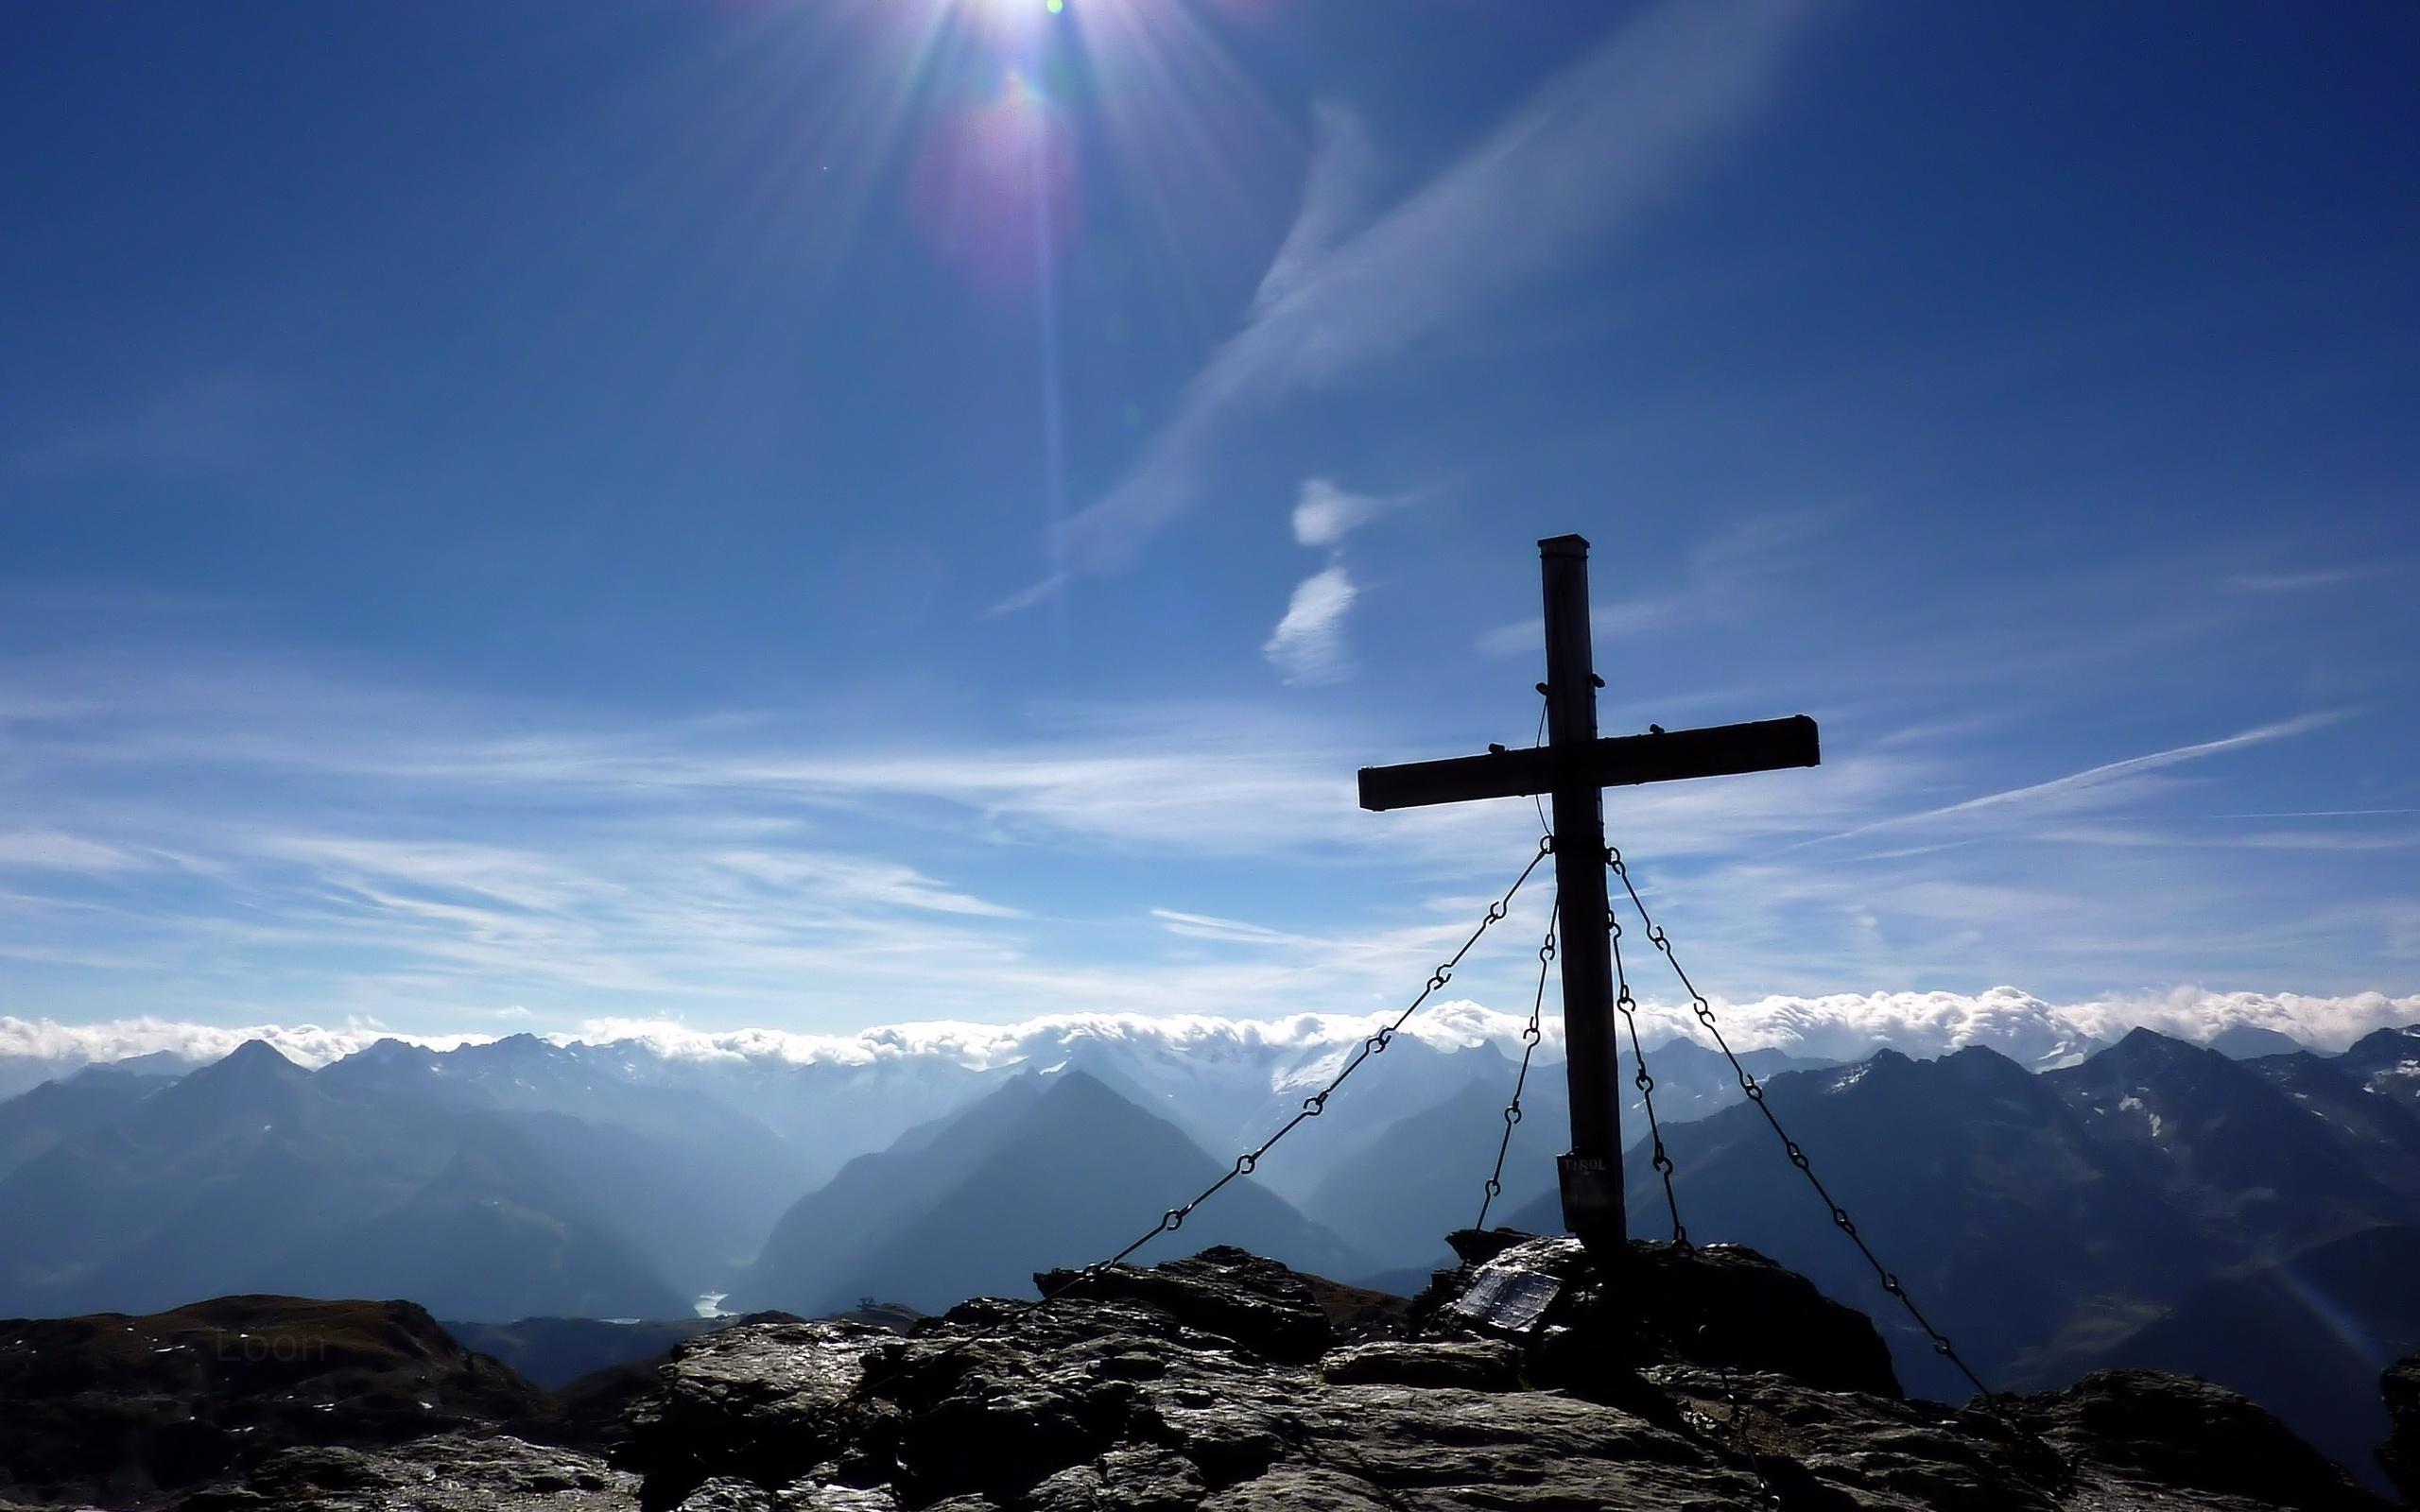 устанавливайте фото на фоне креста примета далеко